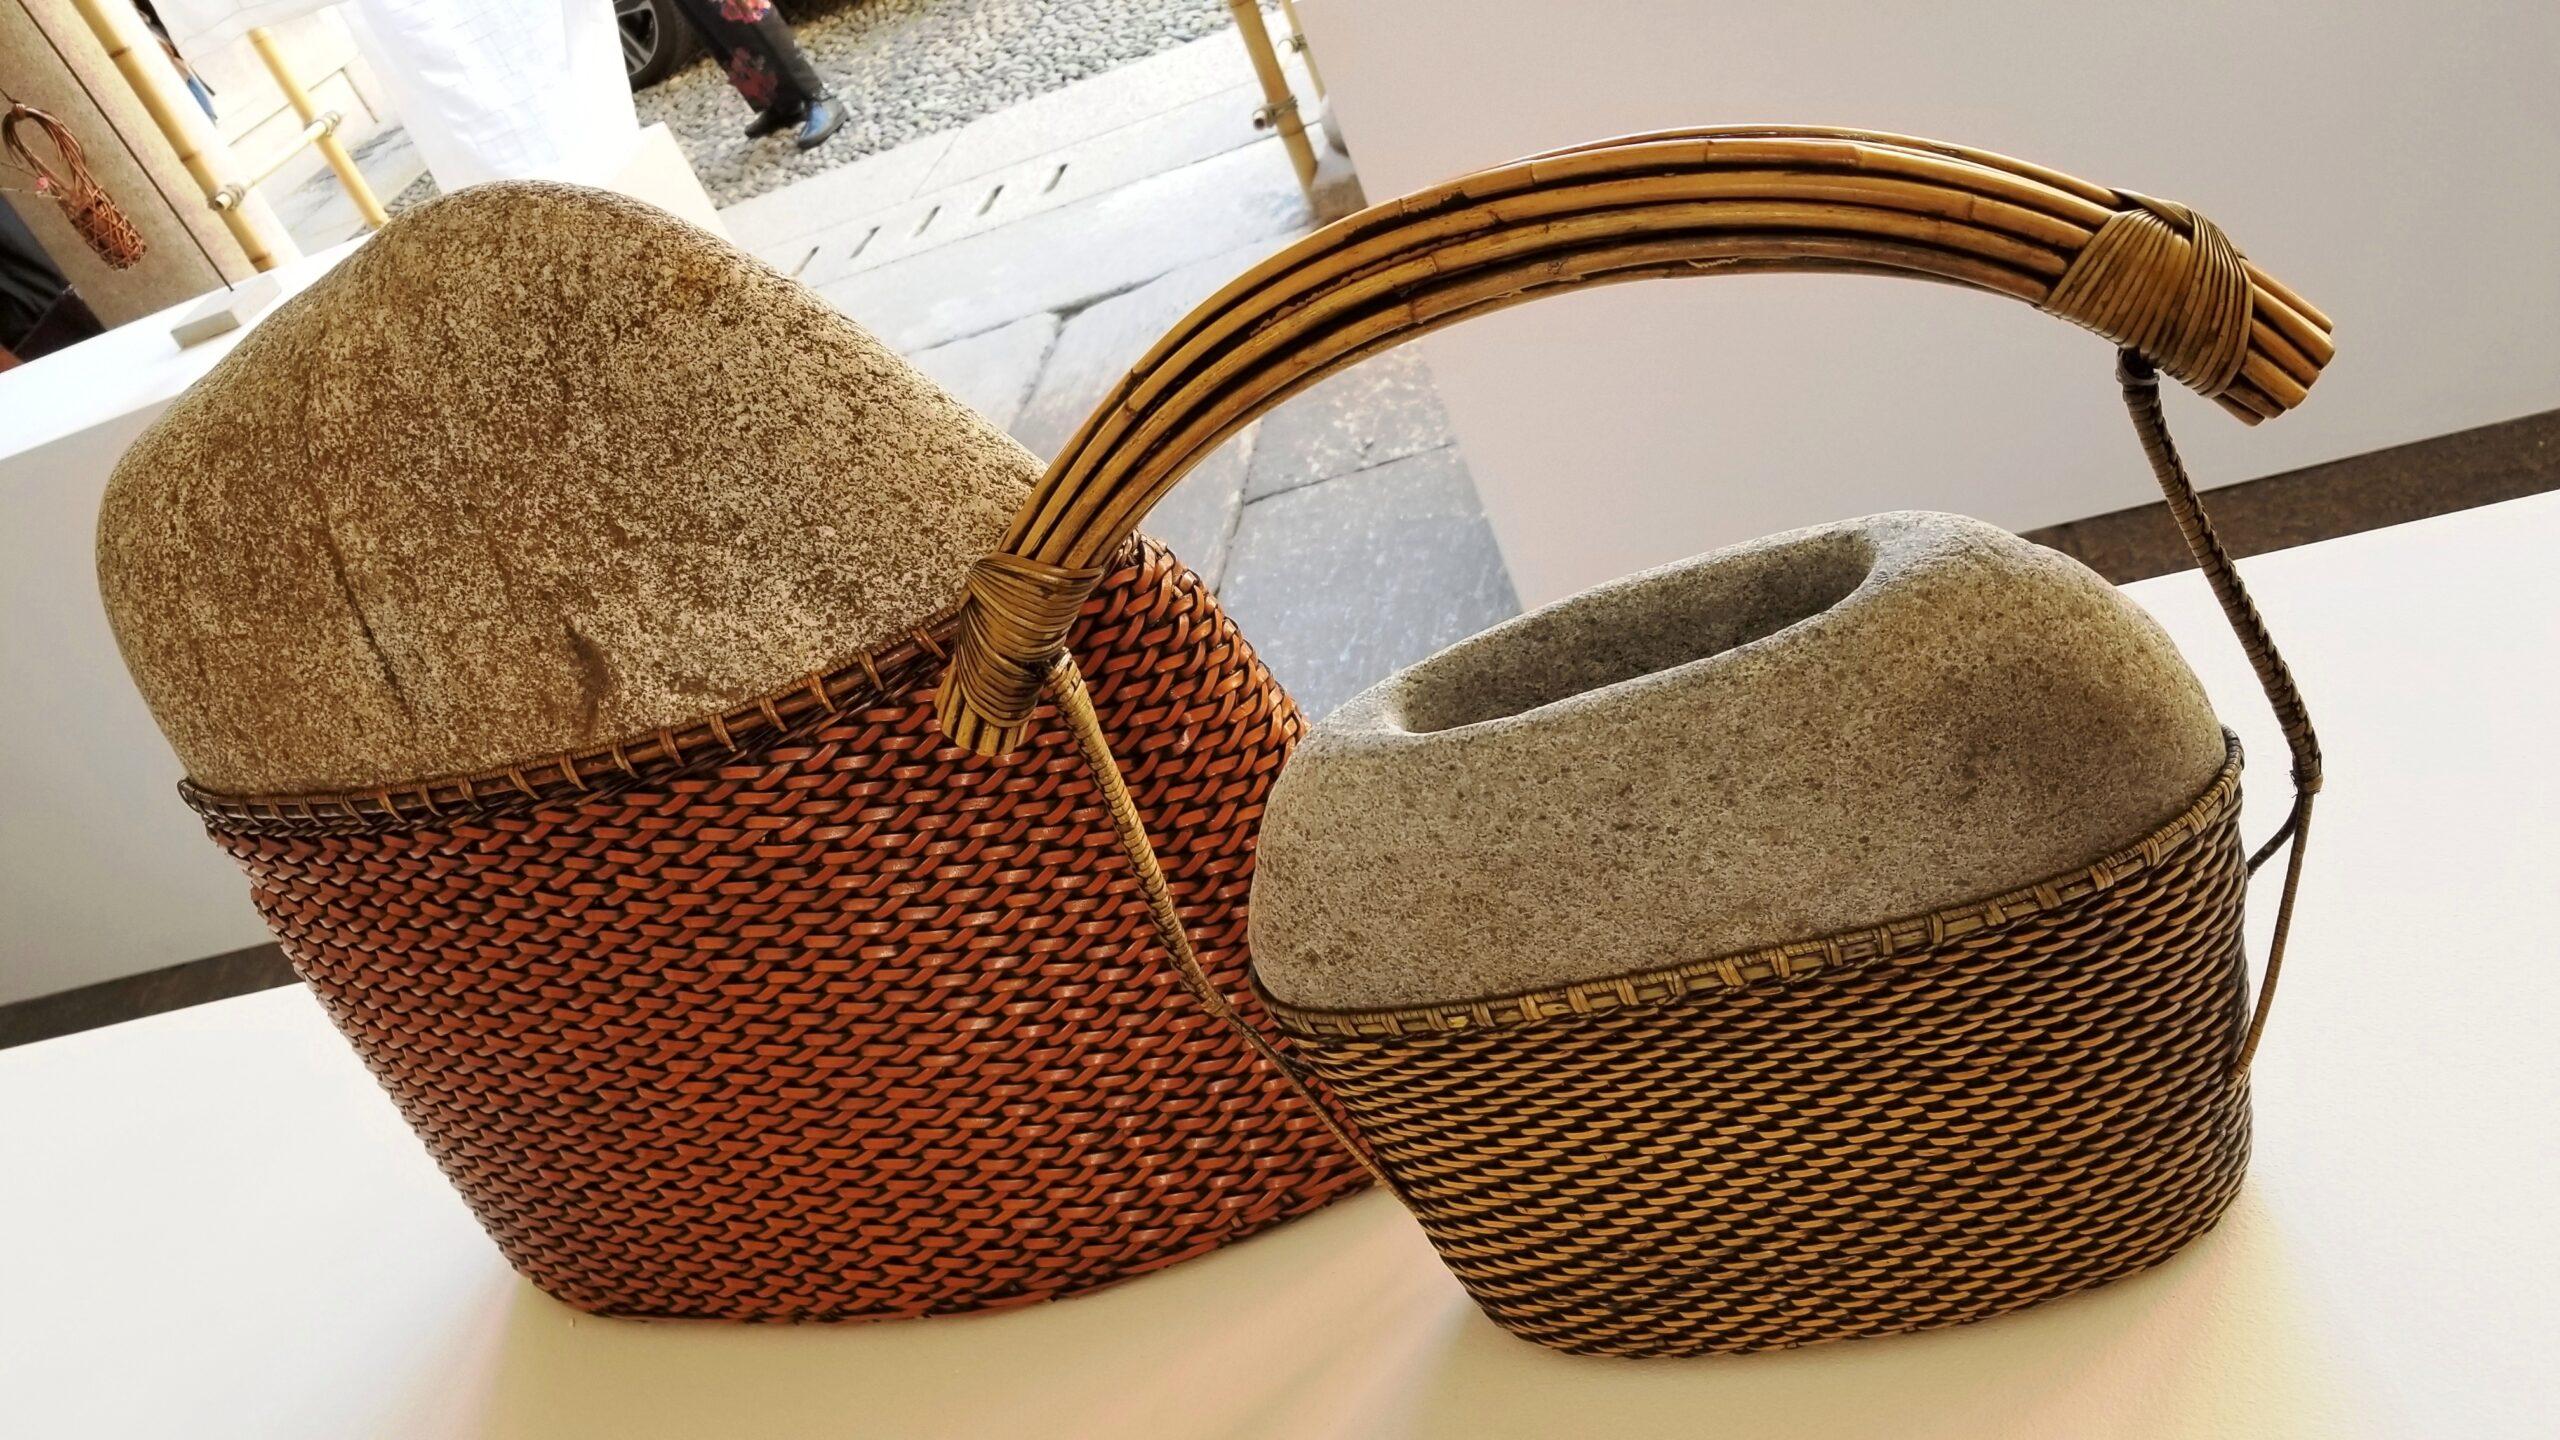 loewe, baskets, milan fashion week, helen siwak, vancouver, bc, vancity, yvr, made in italy, ecoluxluv, folioyvr, luxury, lifestyle